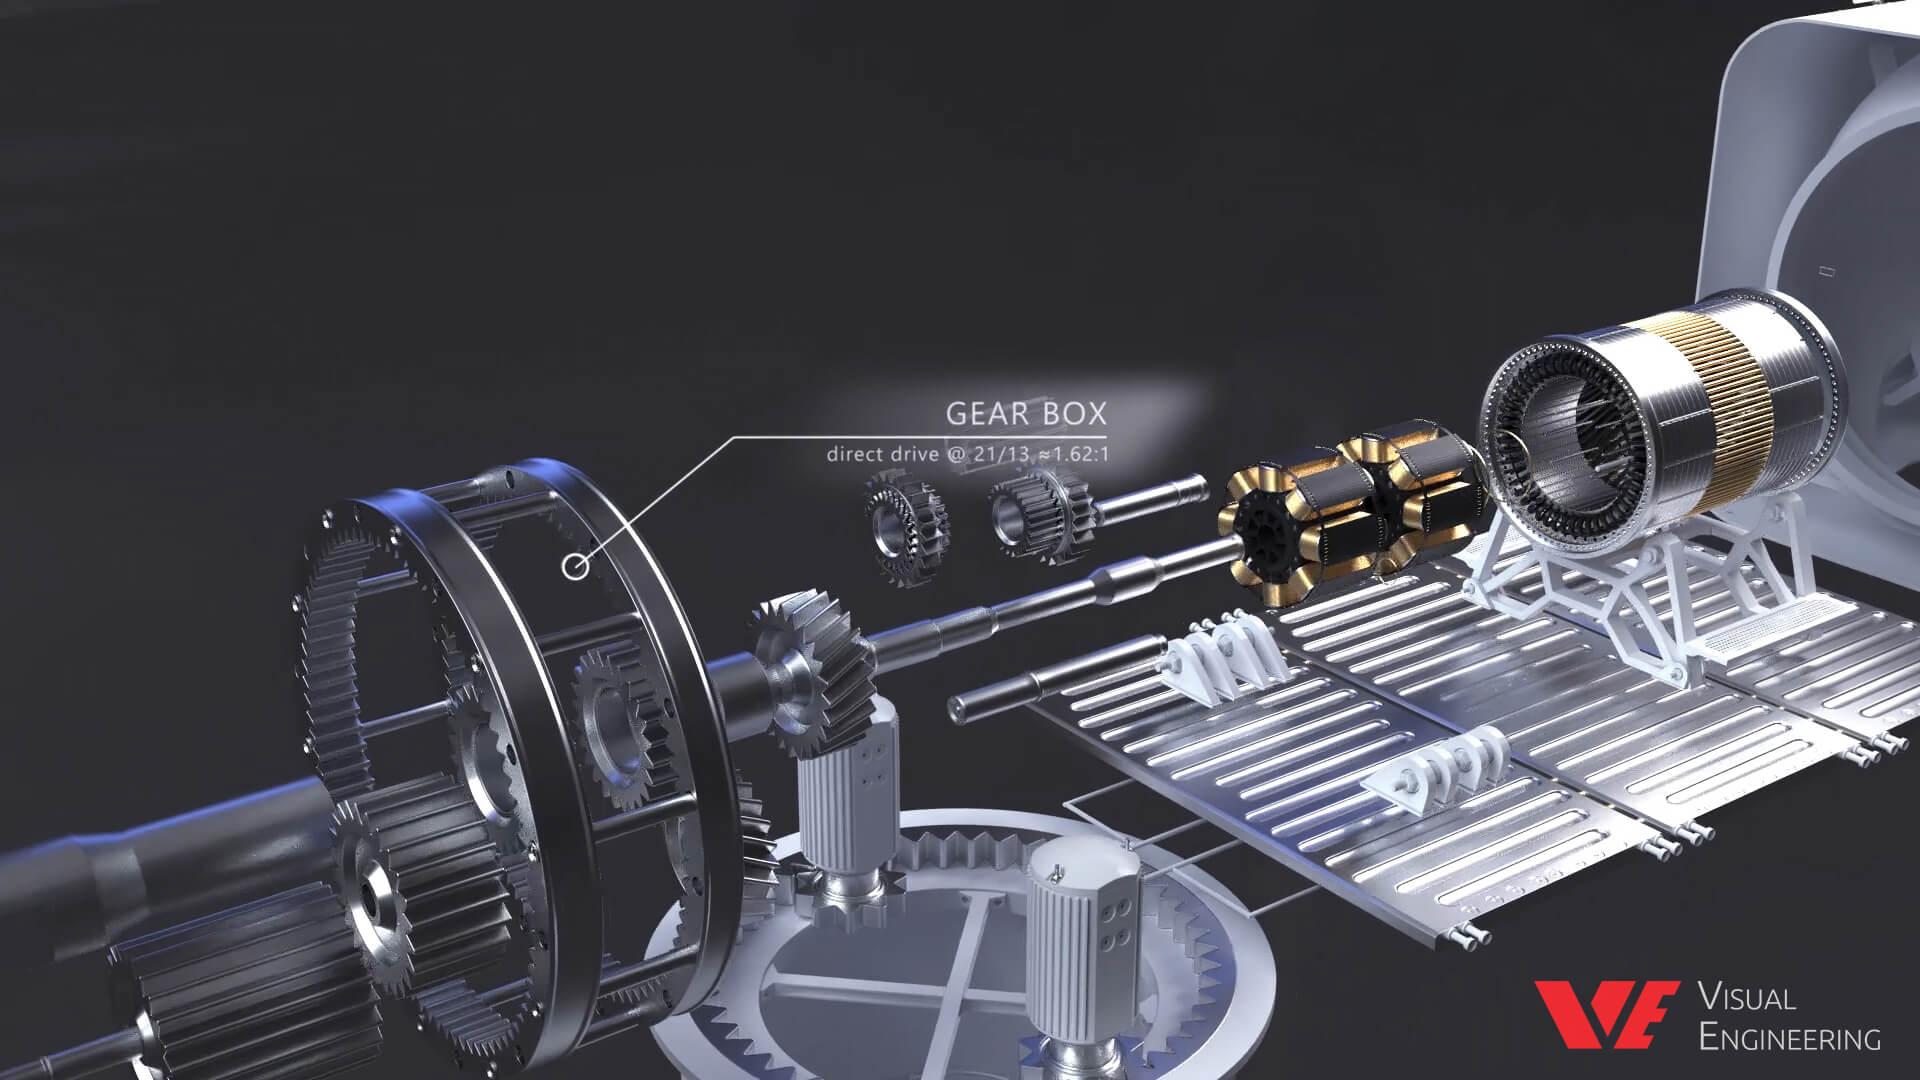 VE-Home-OurWorks-Explodedwindturbine-1920px-001 Our Work